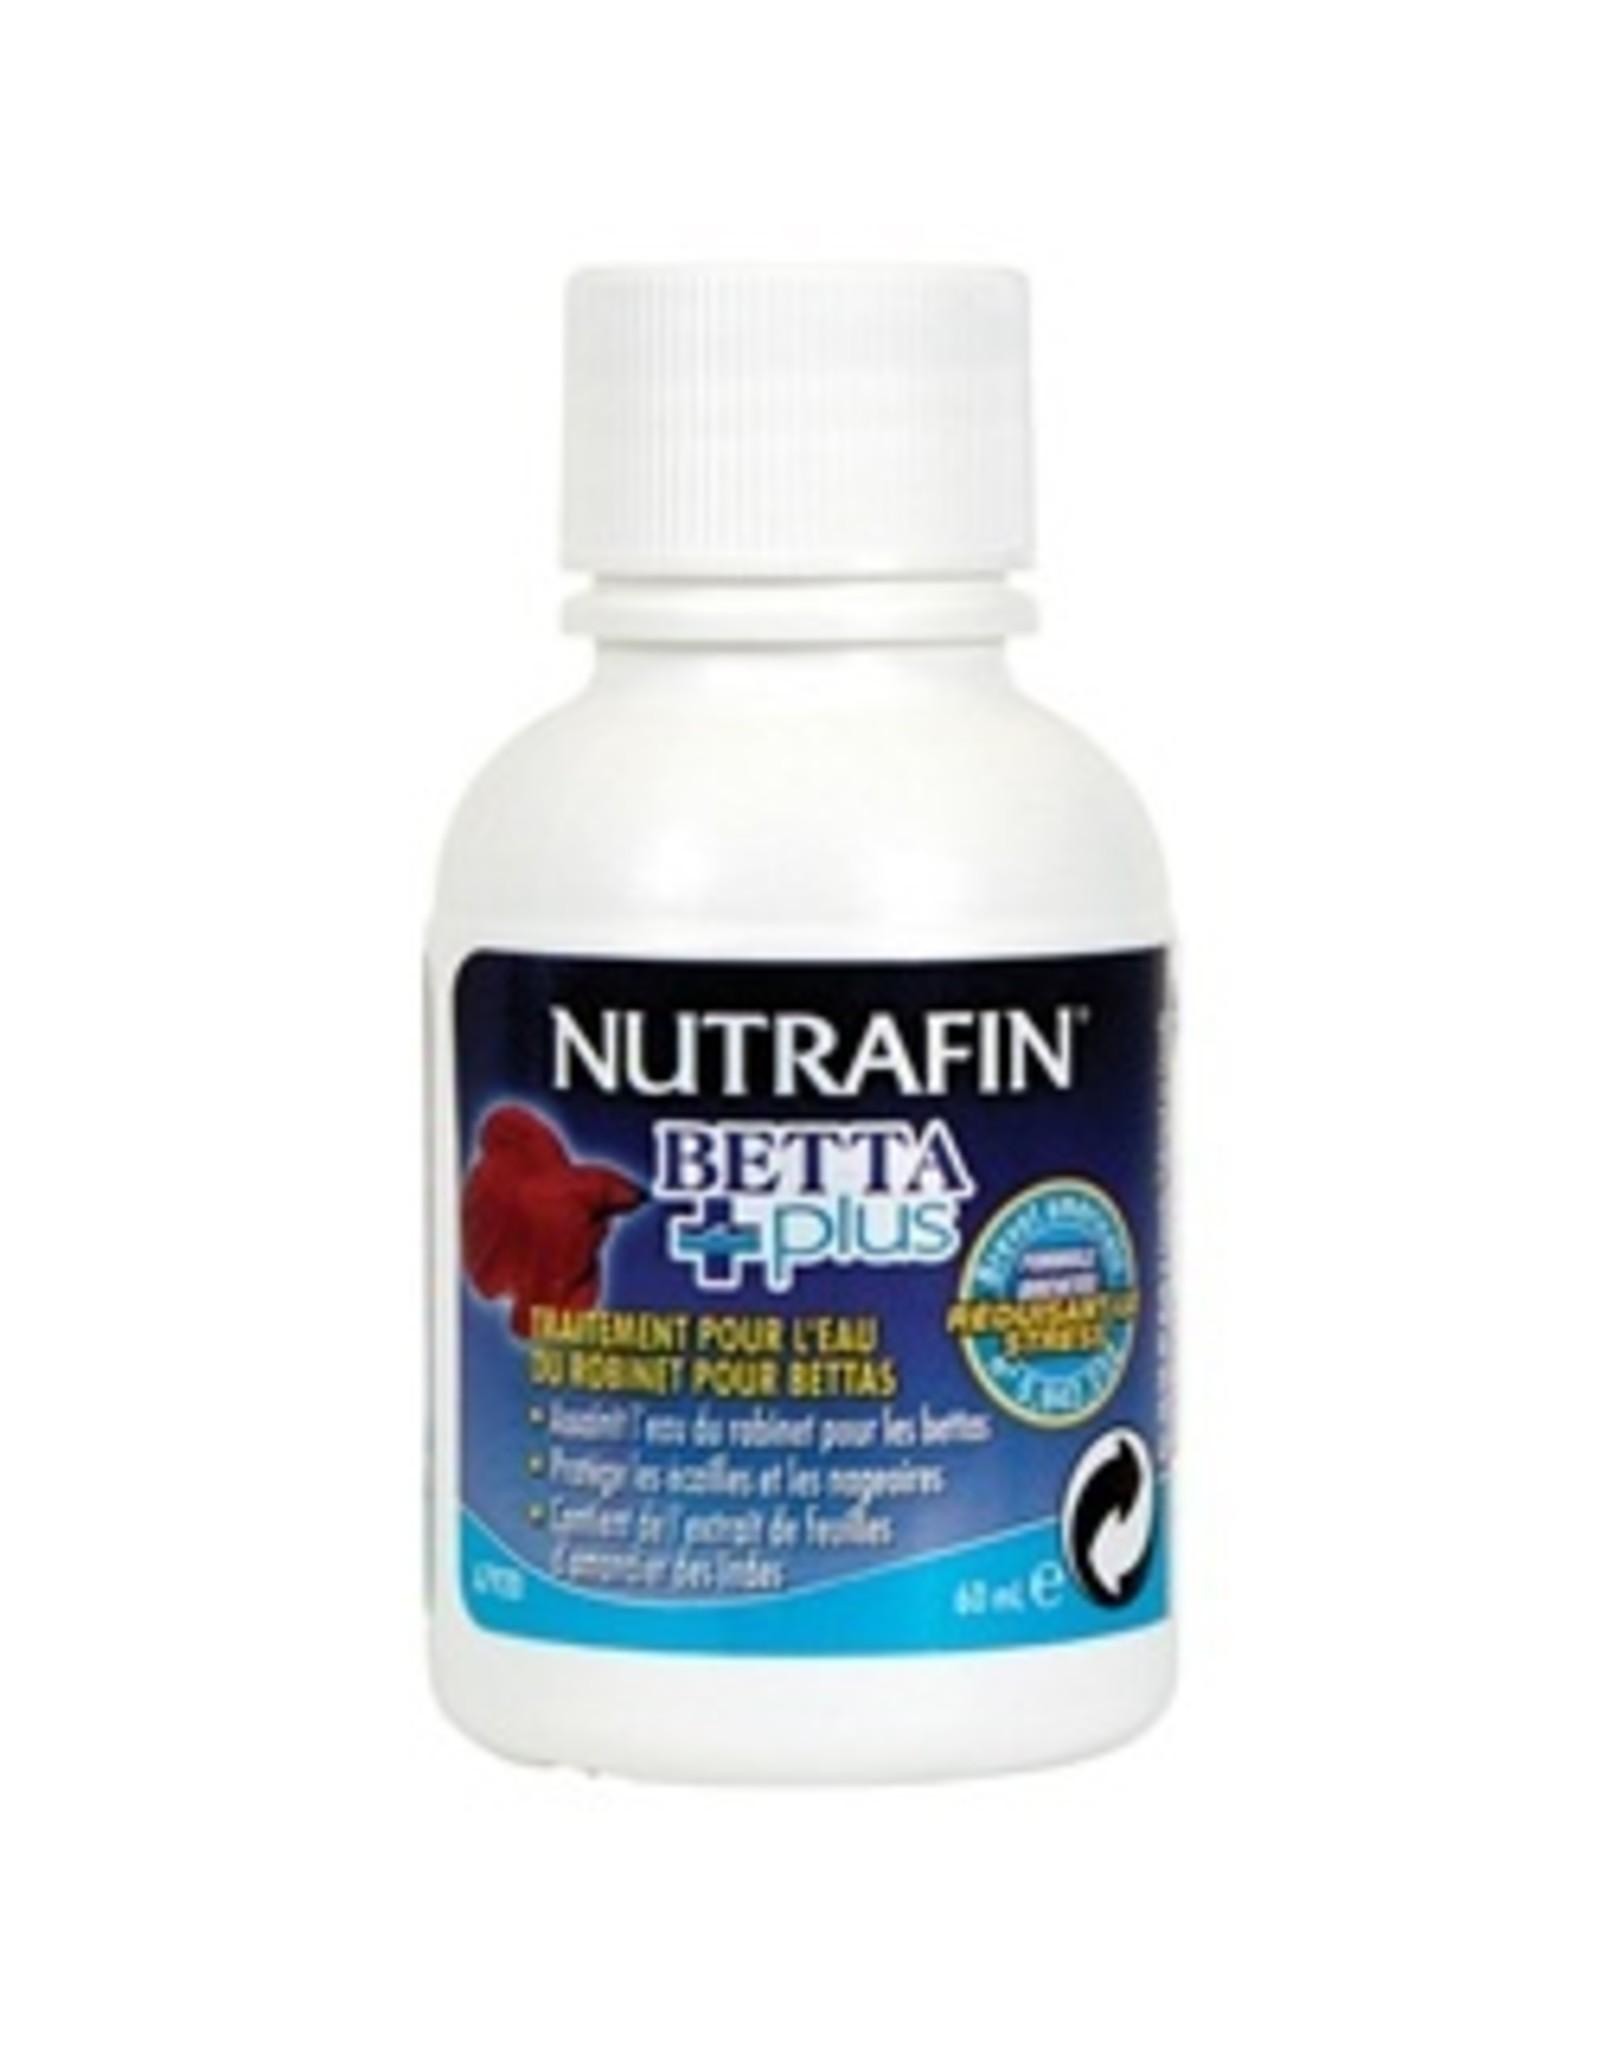 NutraFin NUTRAFIN Betta-Enviro-Clean 60mL (2oz)